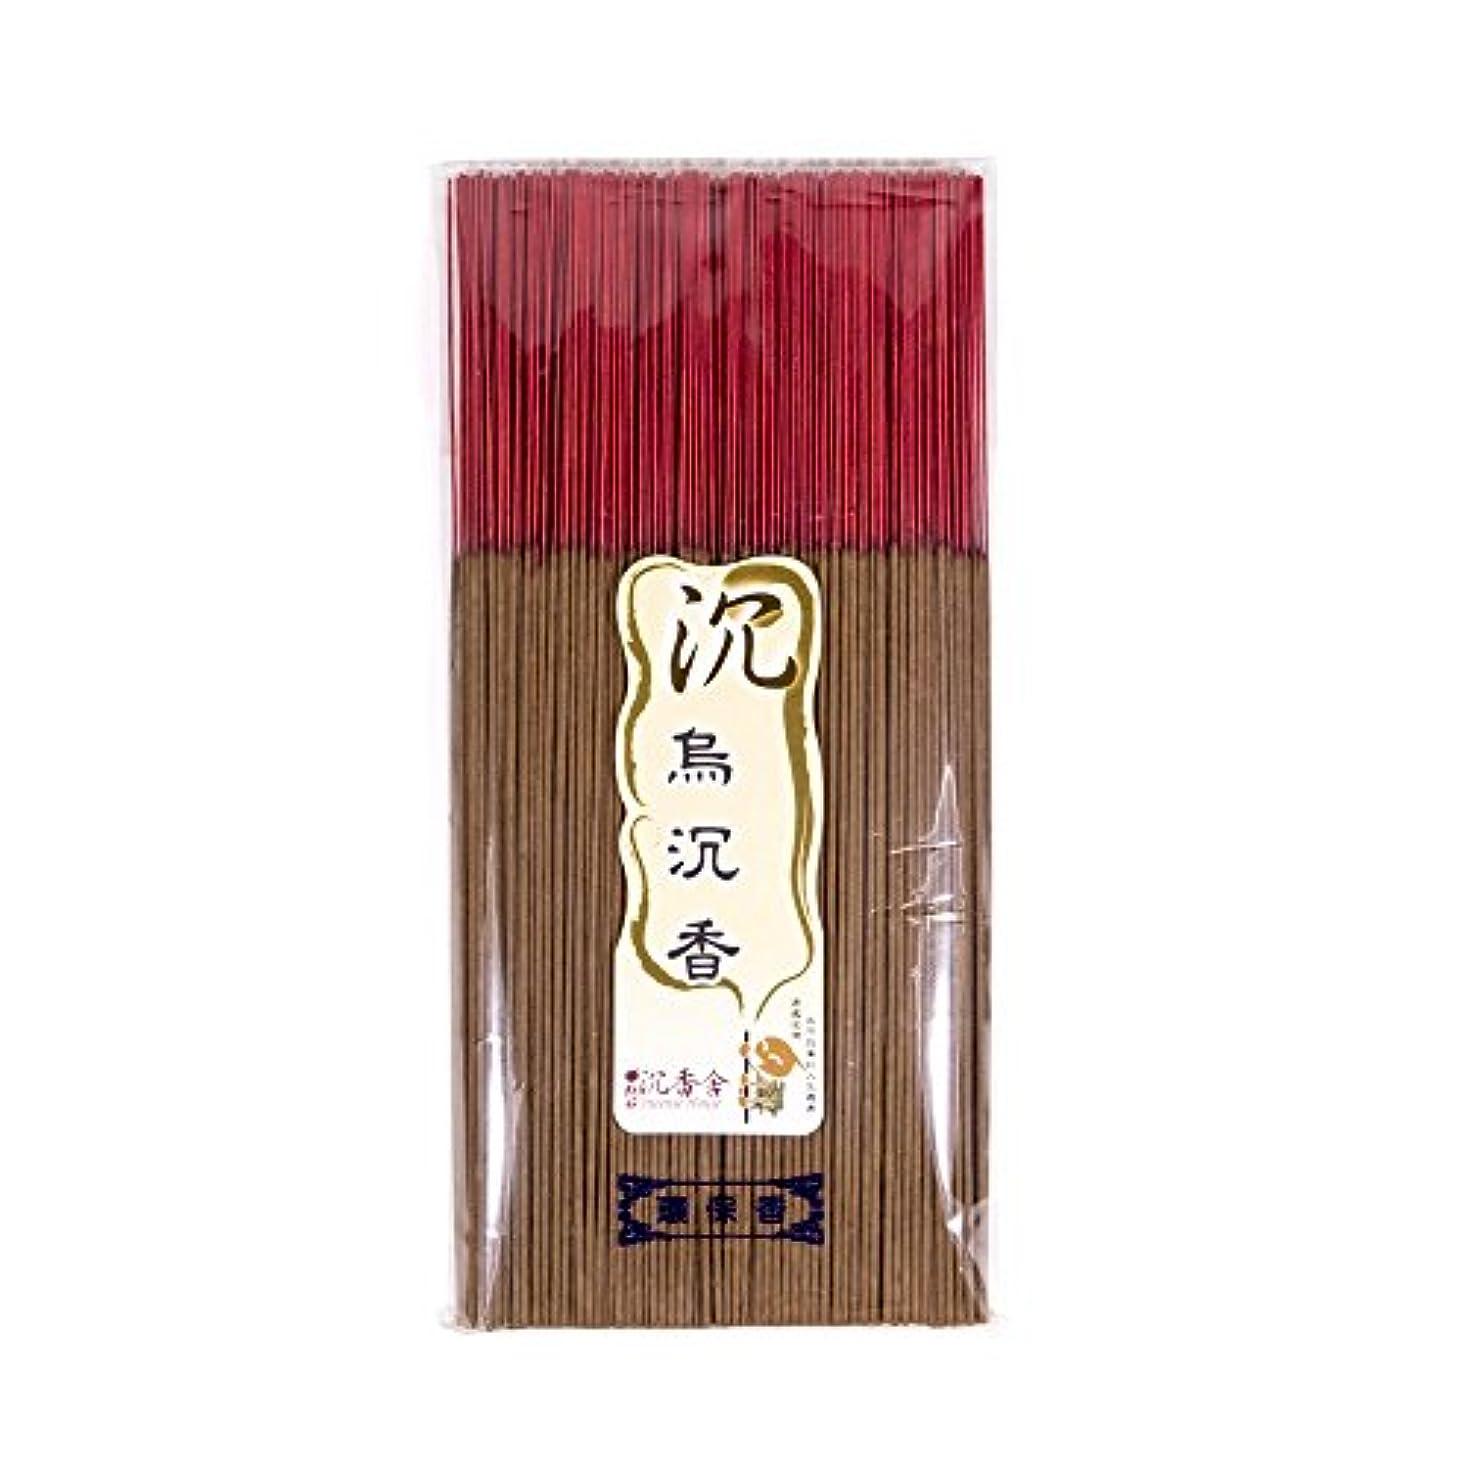 リテラシー青写真最少台湾沉香舍 烏沈香 台湾のお香家 - 沈香 30cm (木支香) 300g 約400本